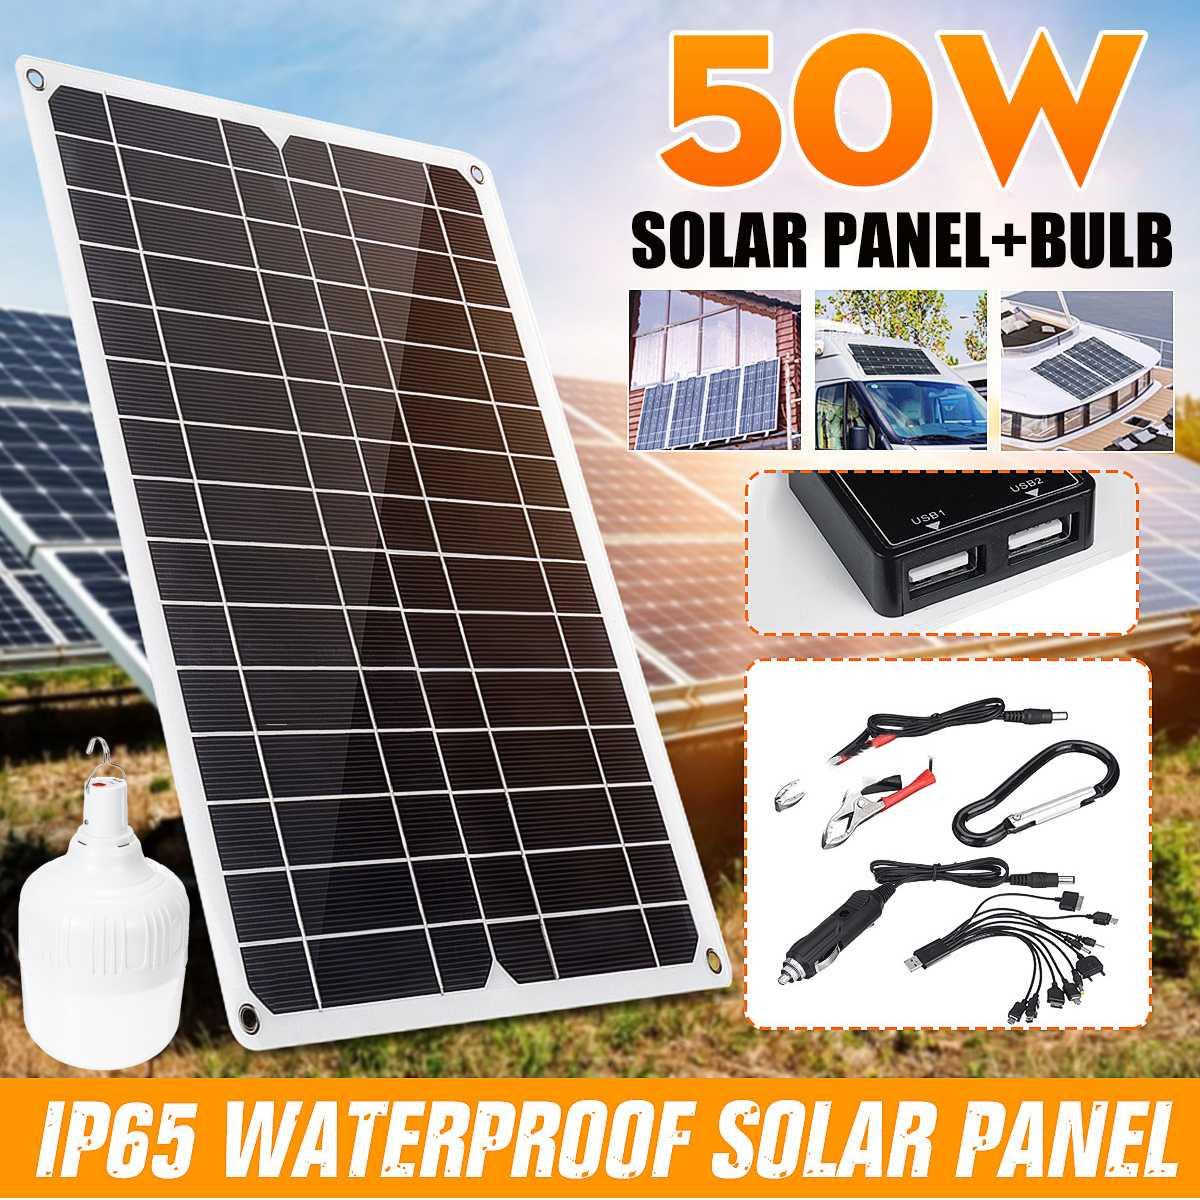 Portable LED Solar Power Outdoor Light 50W Flexible Mono Solar Panel Dual USB Battery Charger 9/15/24/36W Bulb Solar Energy Lamp